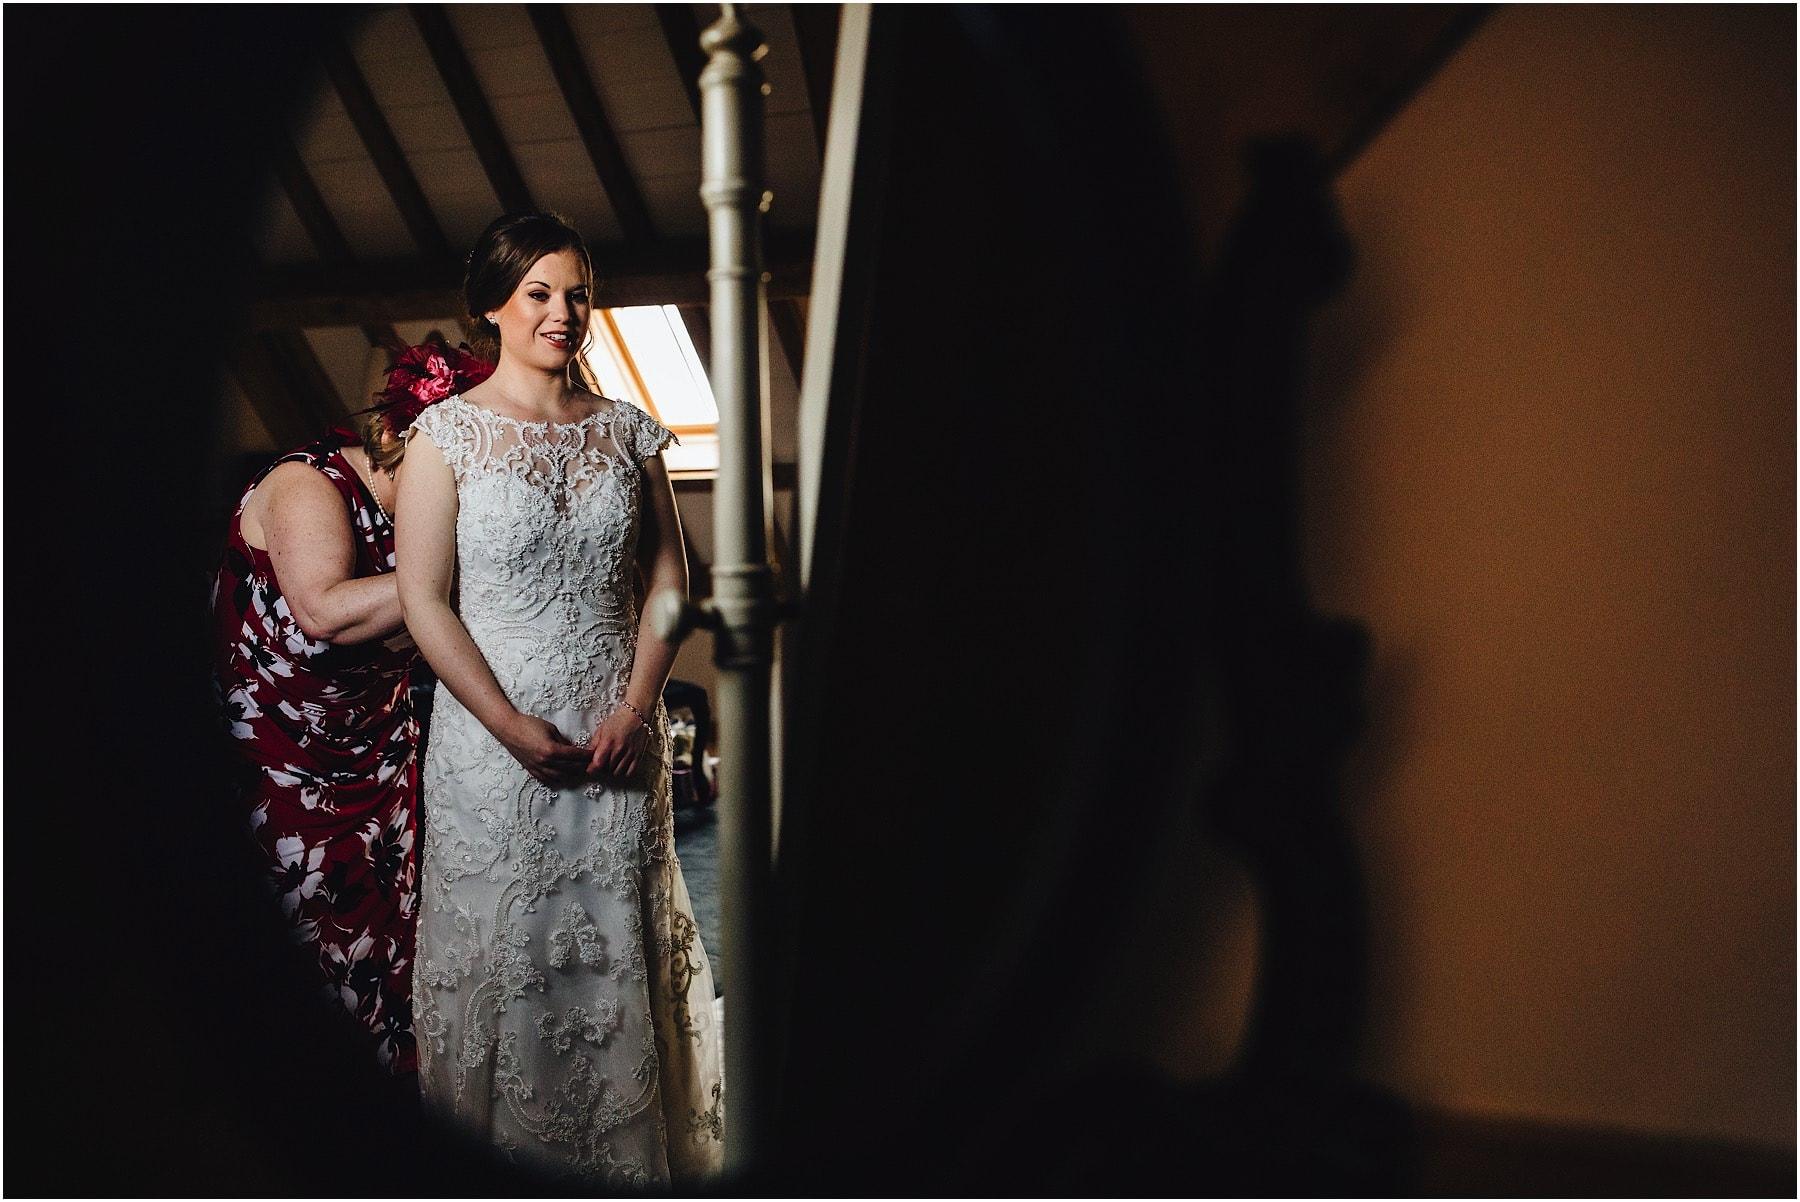 mother zipping up daughters wedding dress